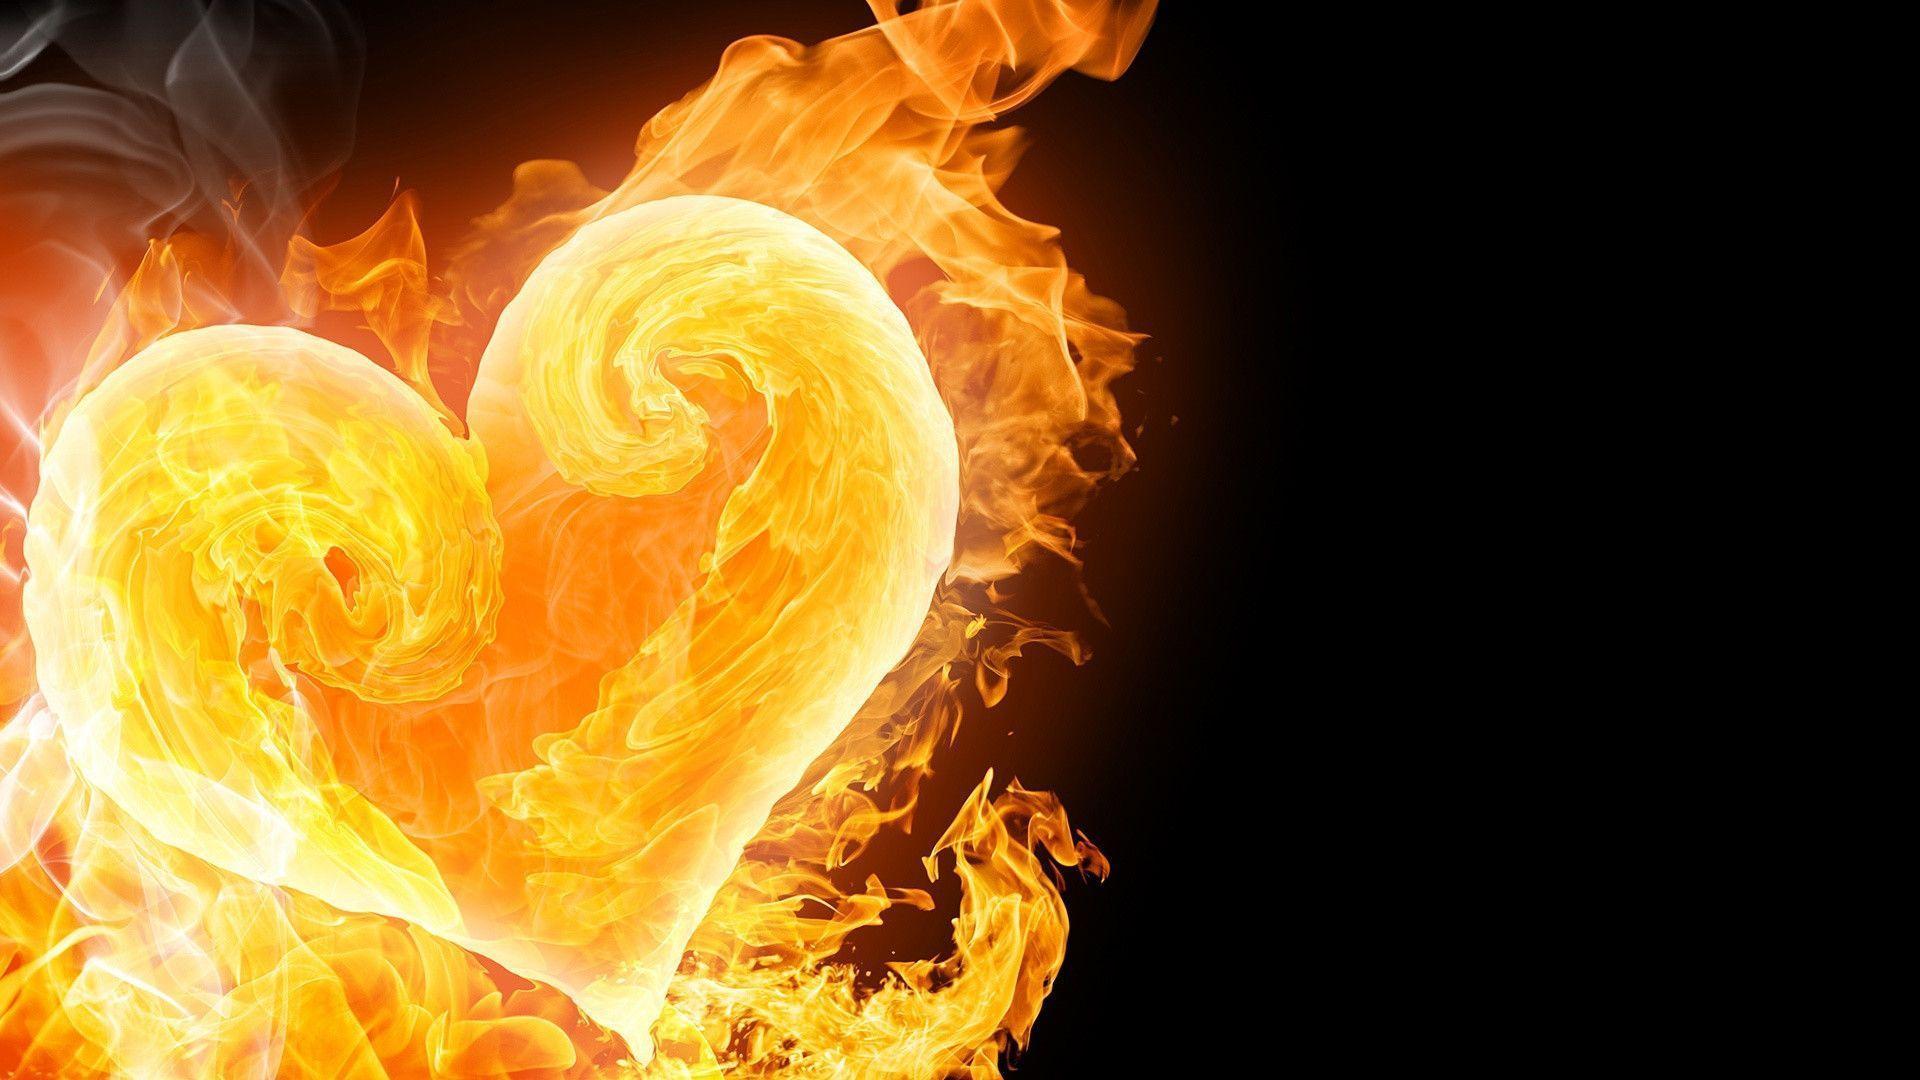 Cool Fire Hearts High Resolution Wallpaper Hd Resolution